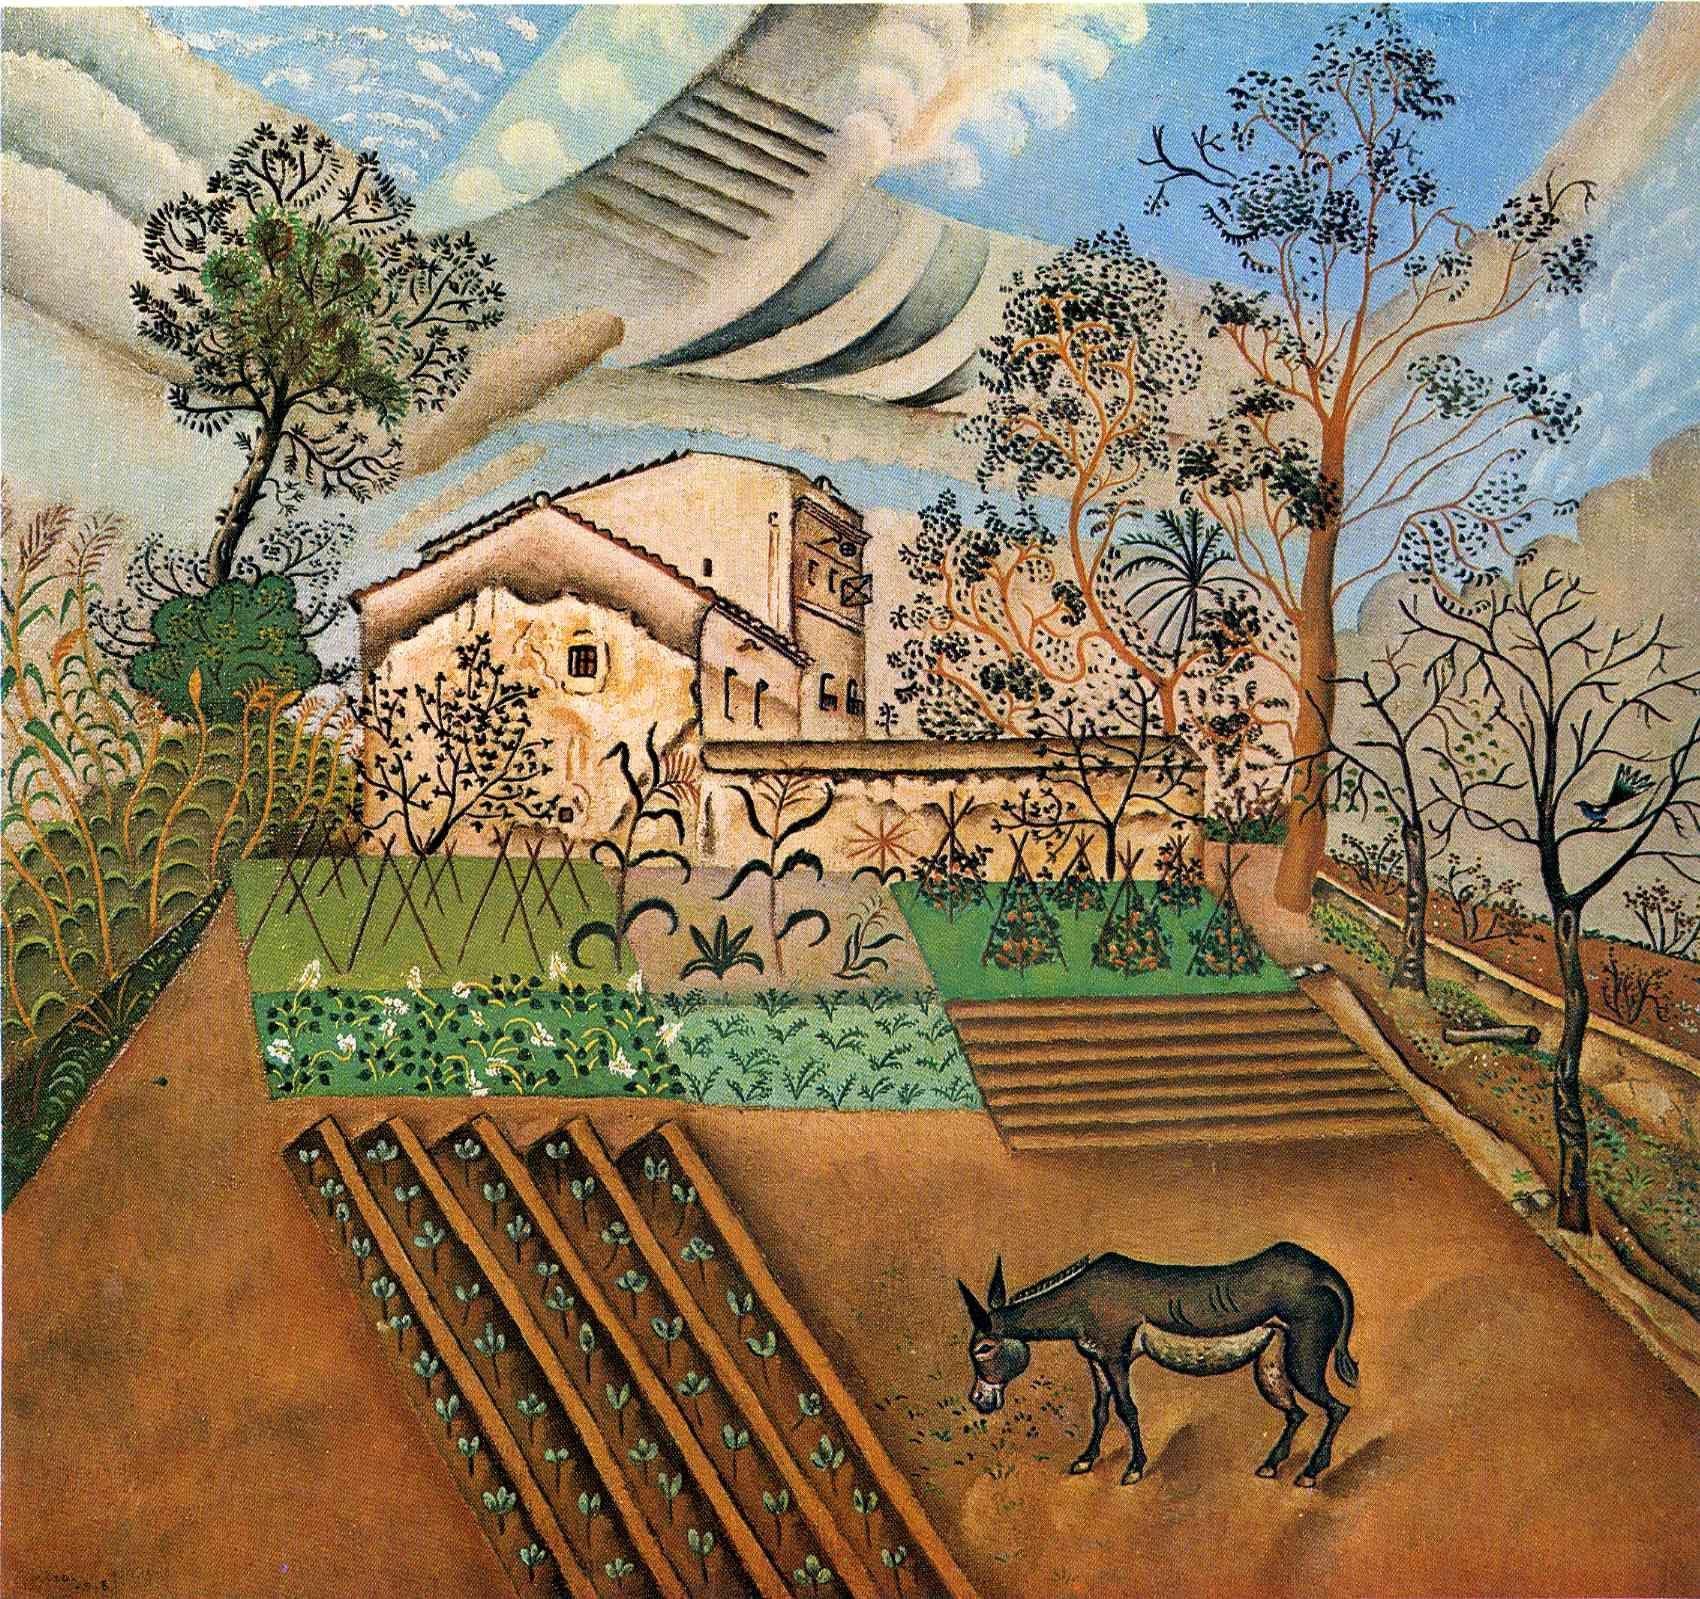 The Vegetable Garden with Donkey, Joan Miro